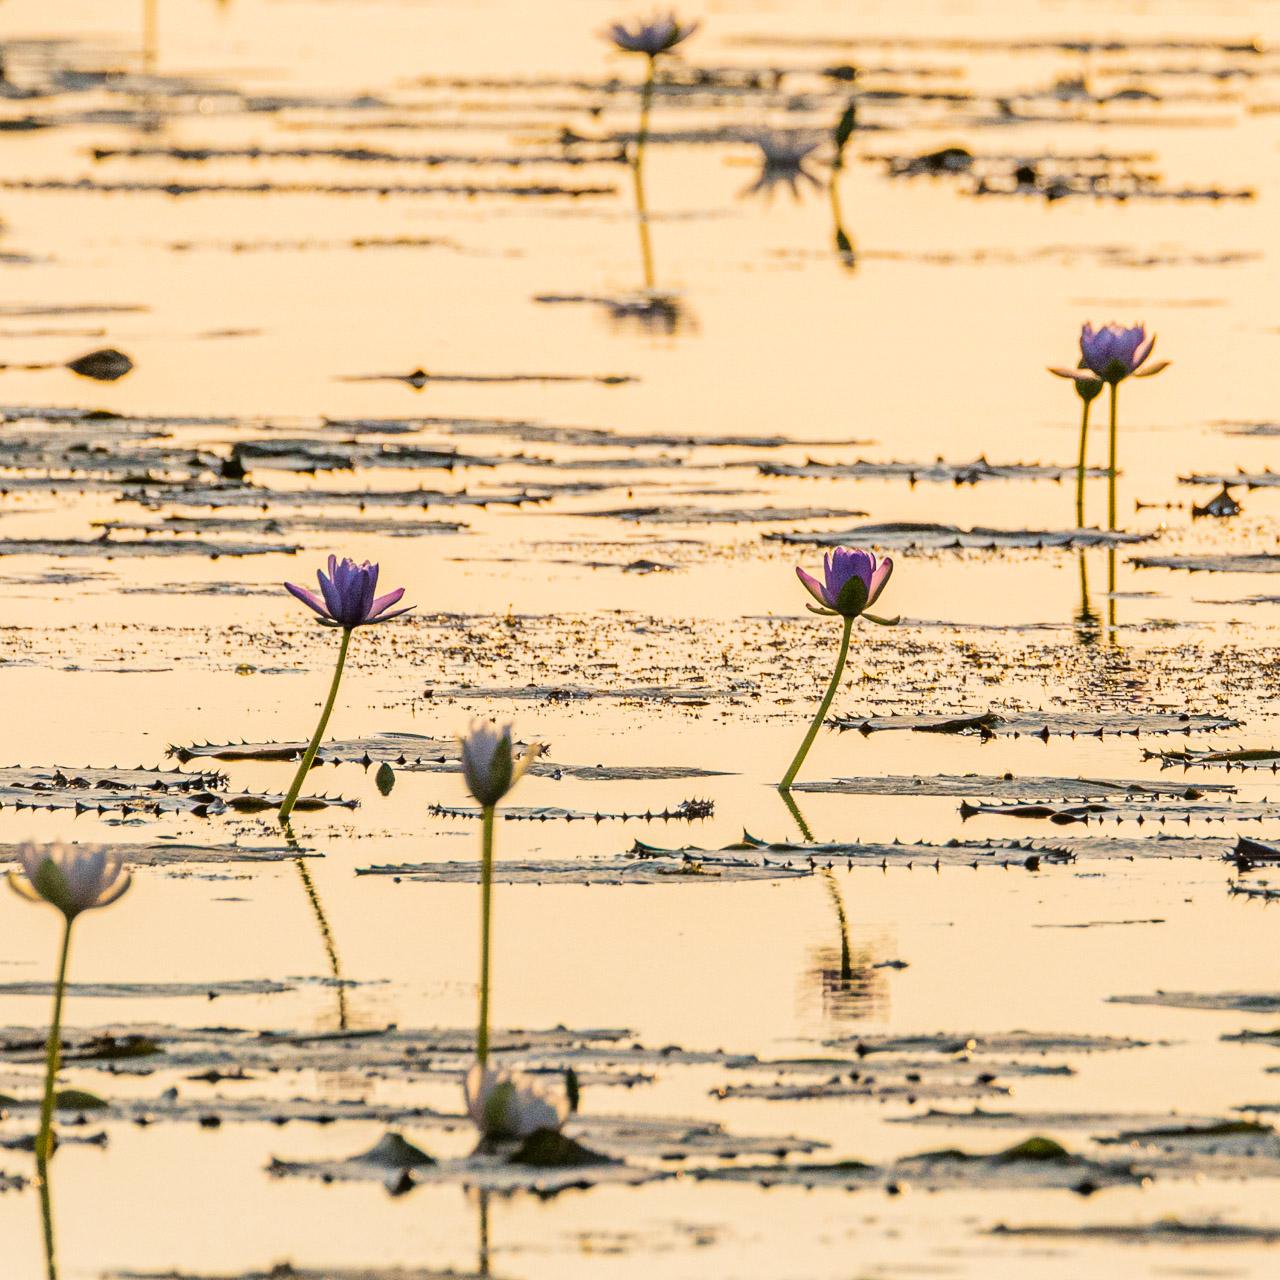 Reflections of waterlilies in Marlgu Billabong, Western Australia